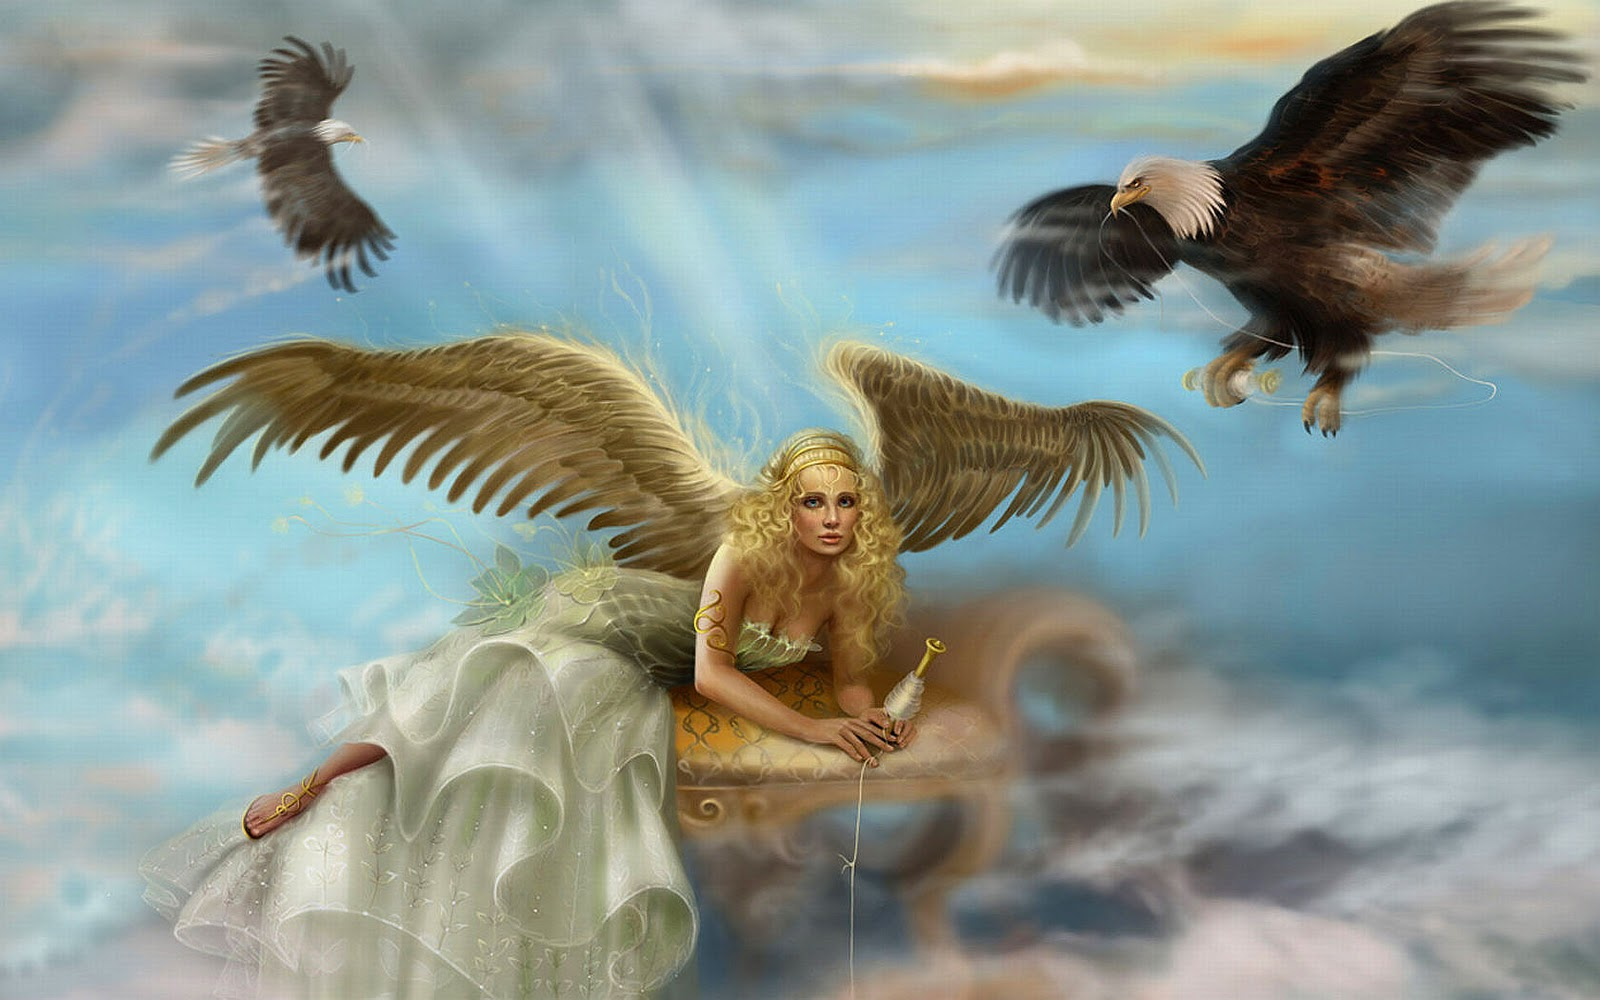 Desktop Angel Screensavers